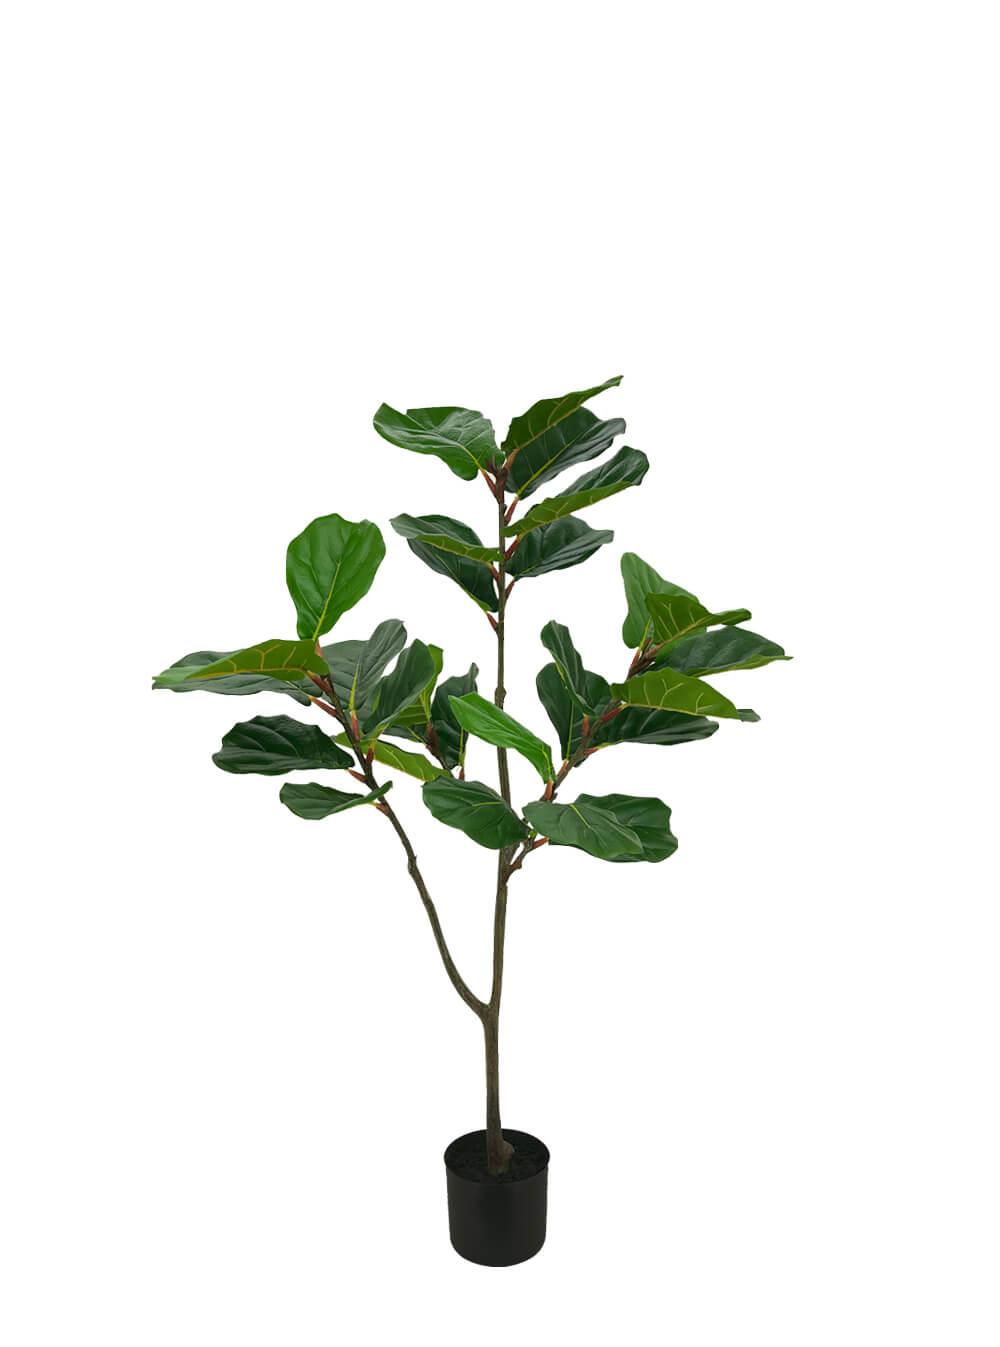 1.2 fiddle/ficus plant